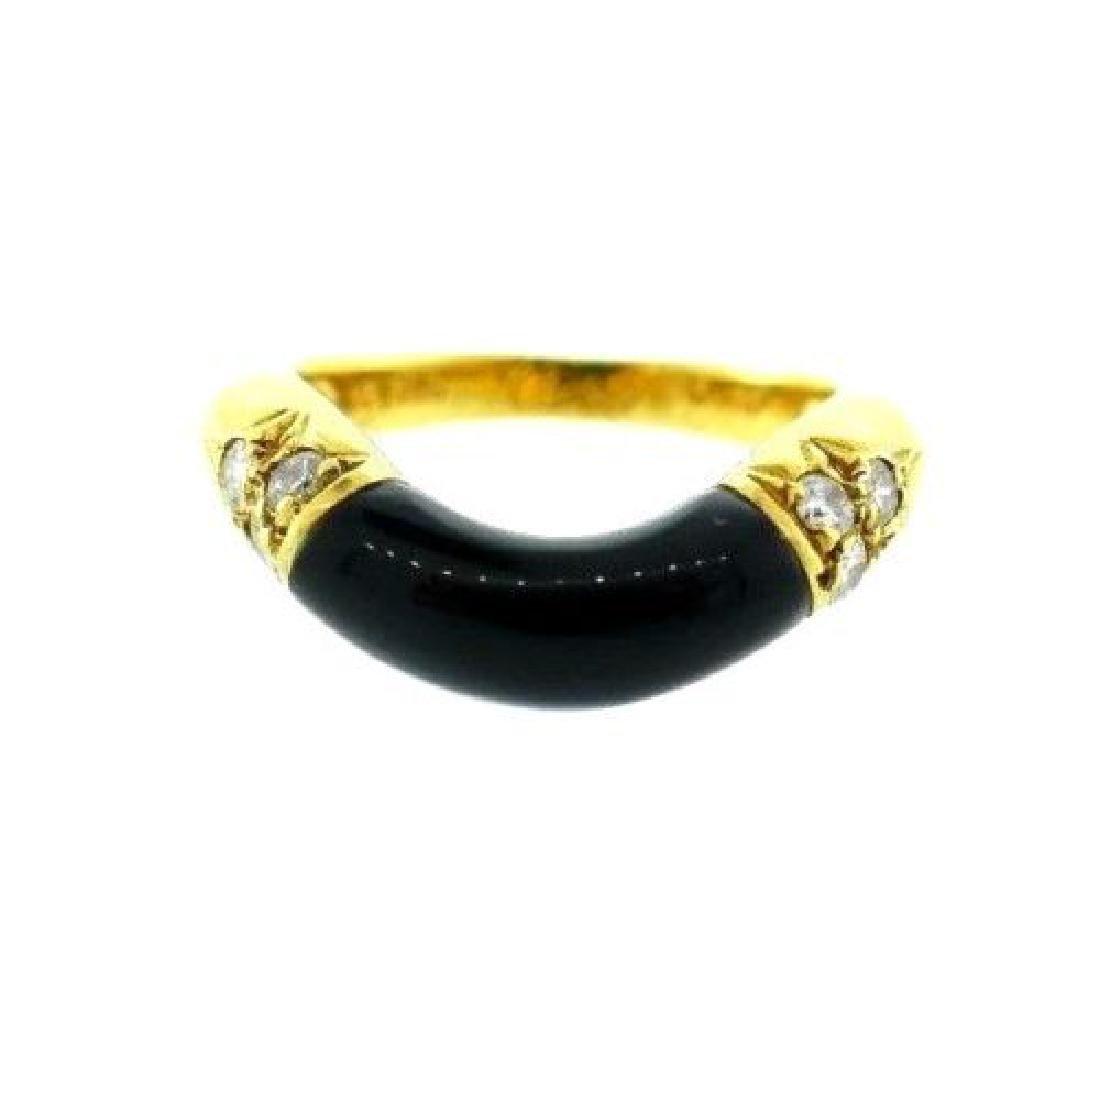 CARTIER 18k Yellow Gold Diamond & Onyx Band Ring - Feb 27